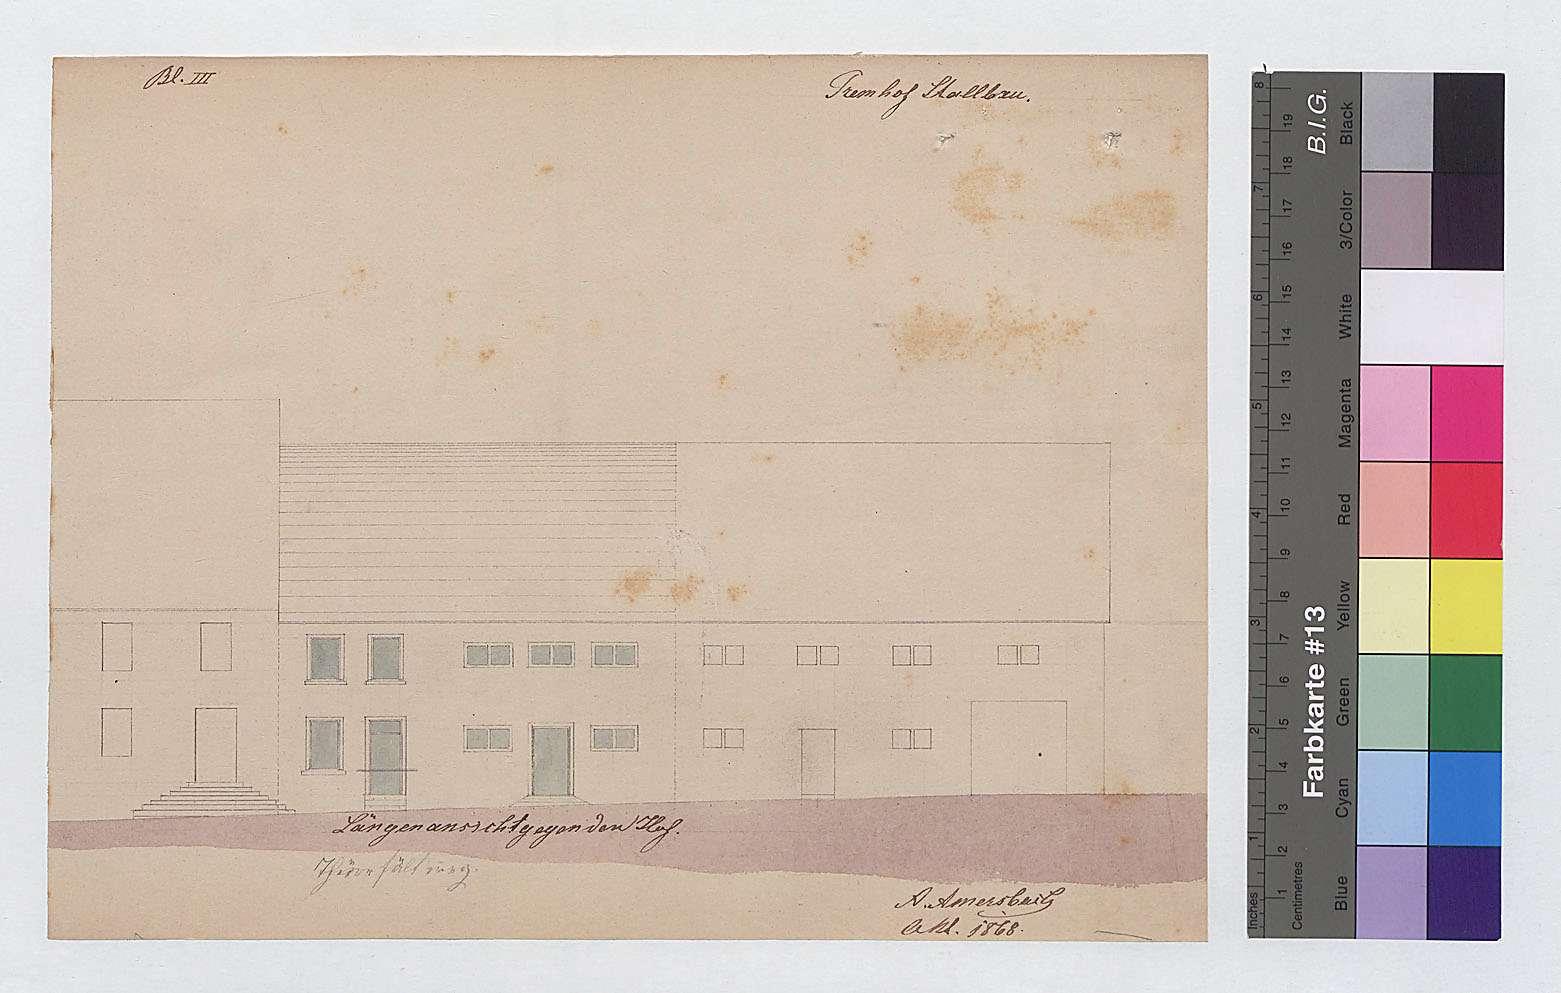 Umbau eines Stalles auf dem Hofgut Tremhof (Blatt I), Bild 1